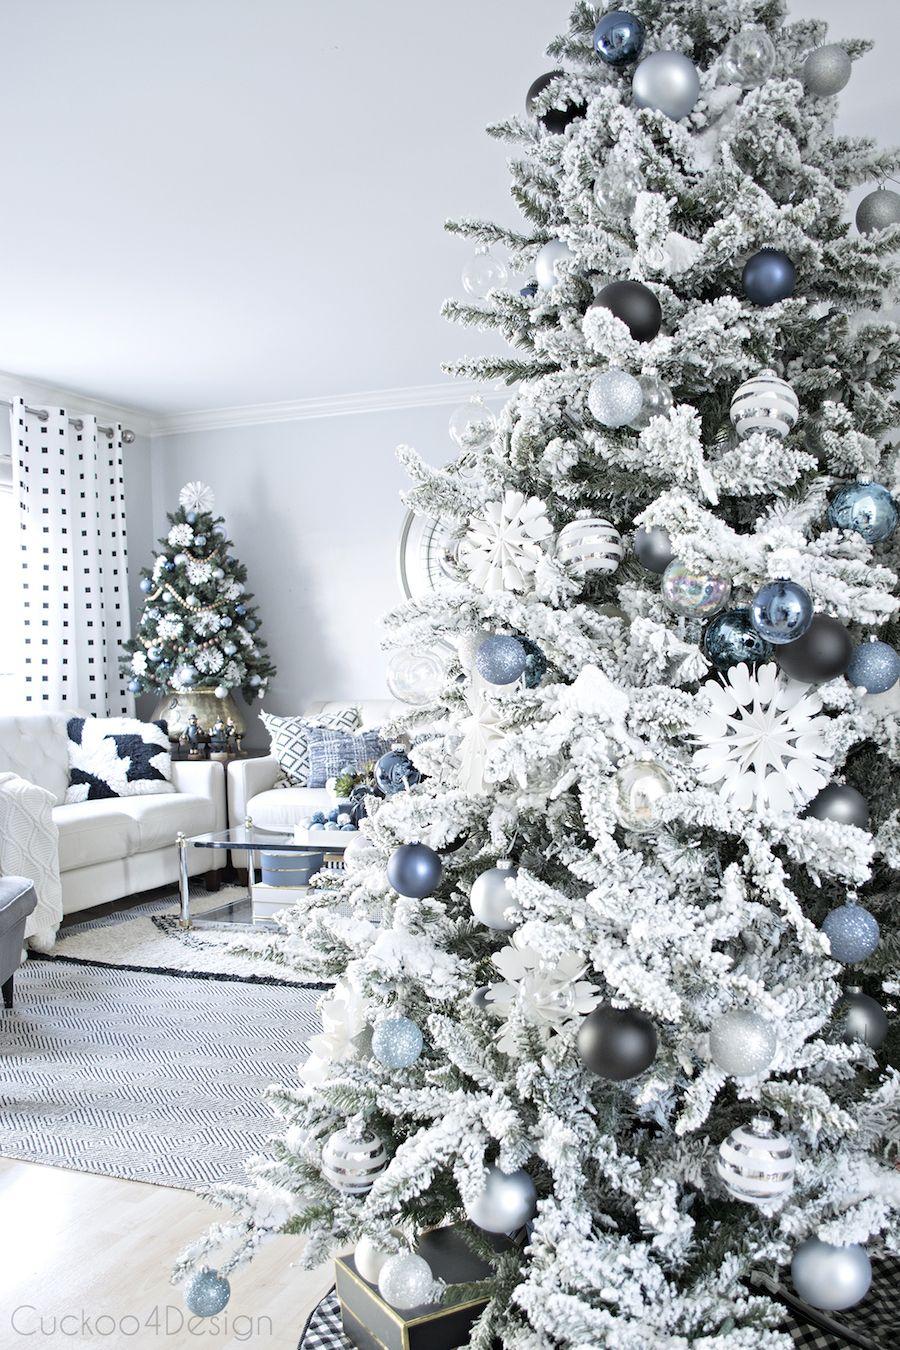 Two Christmas Trees Home Tour via Cuckoo 4 Design